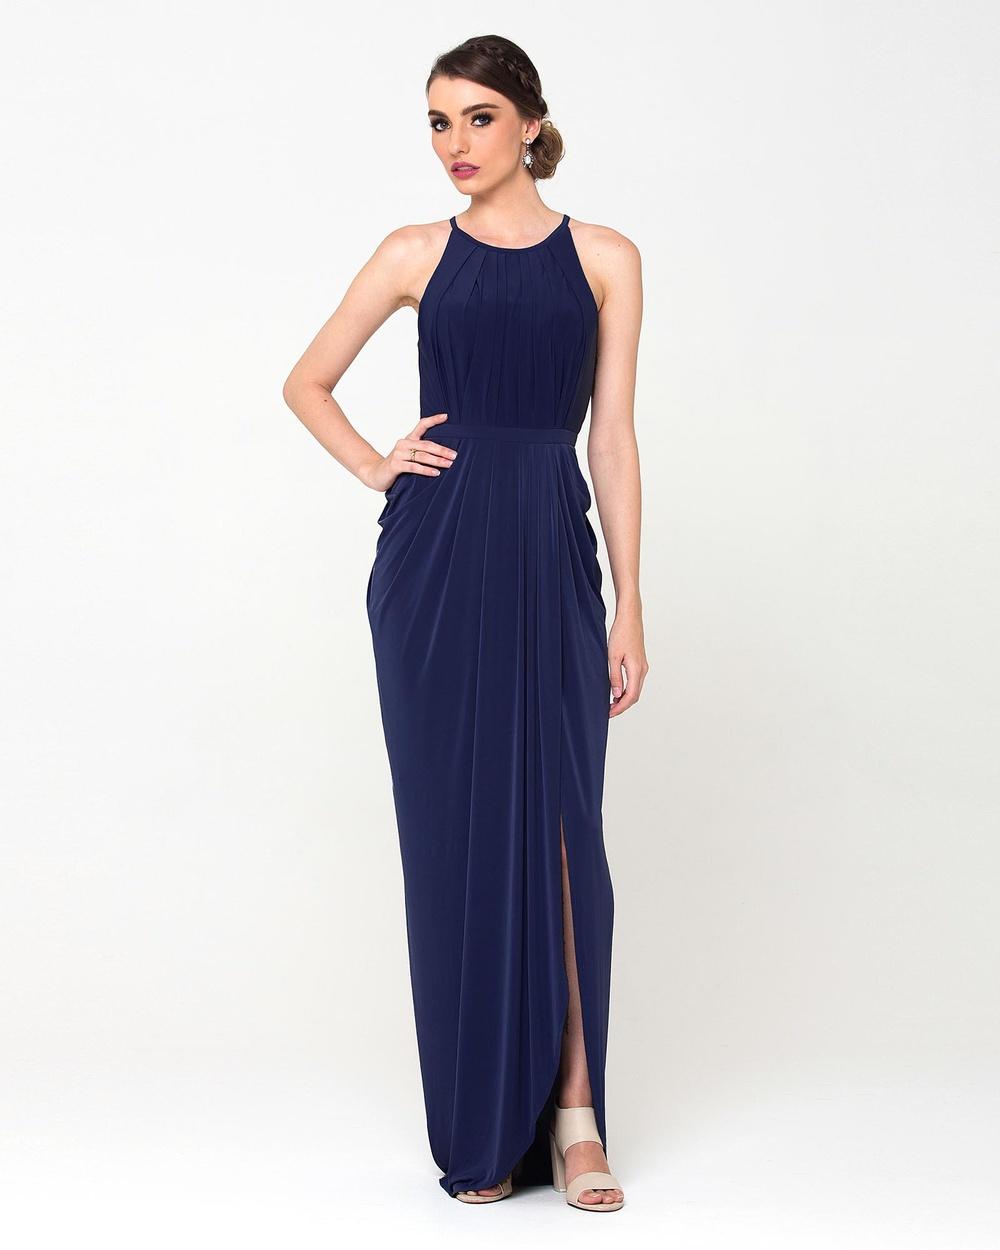 Tania Olsen Designs Sandra Dress Bridesmaid Dresses Navy Sandra Dress